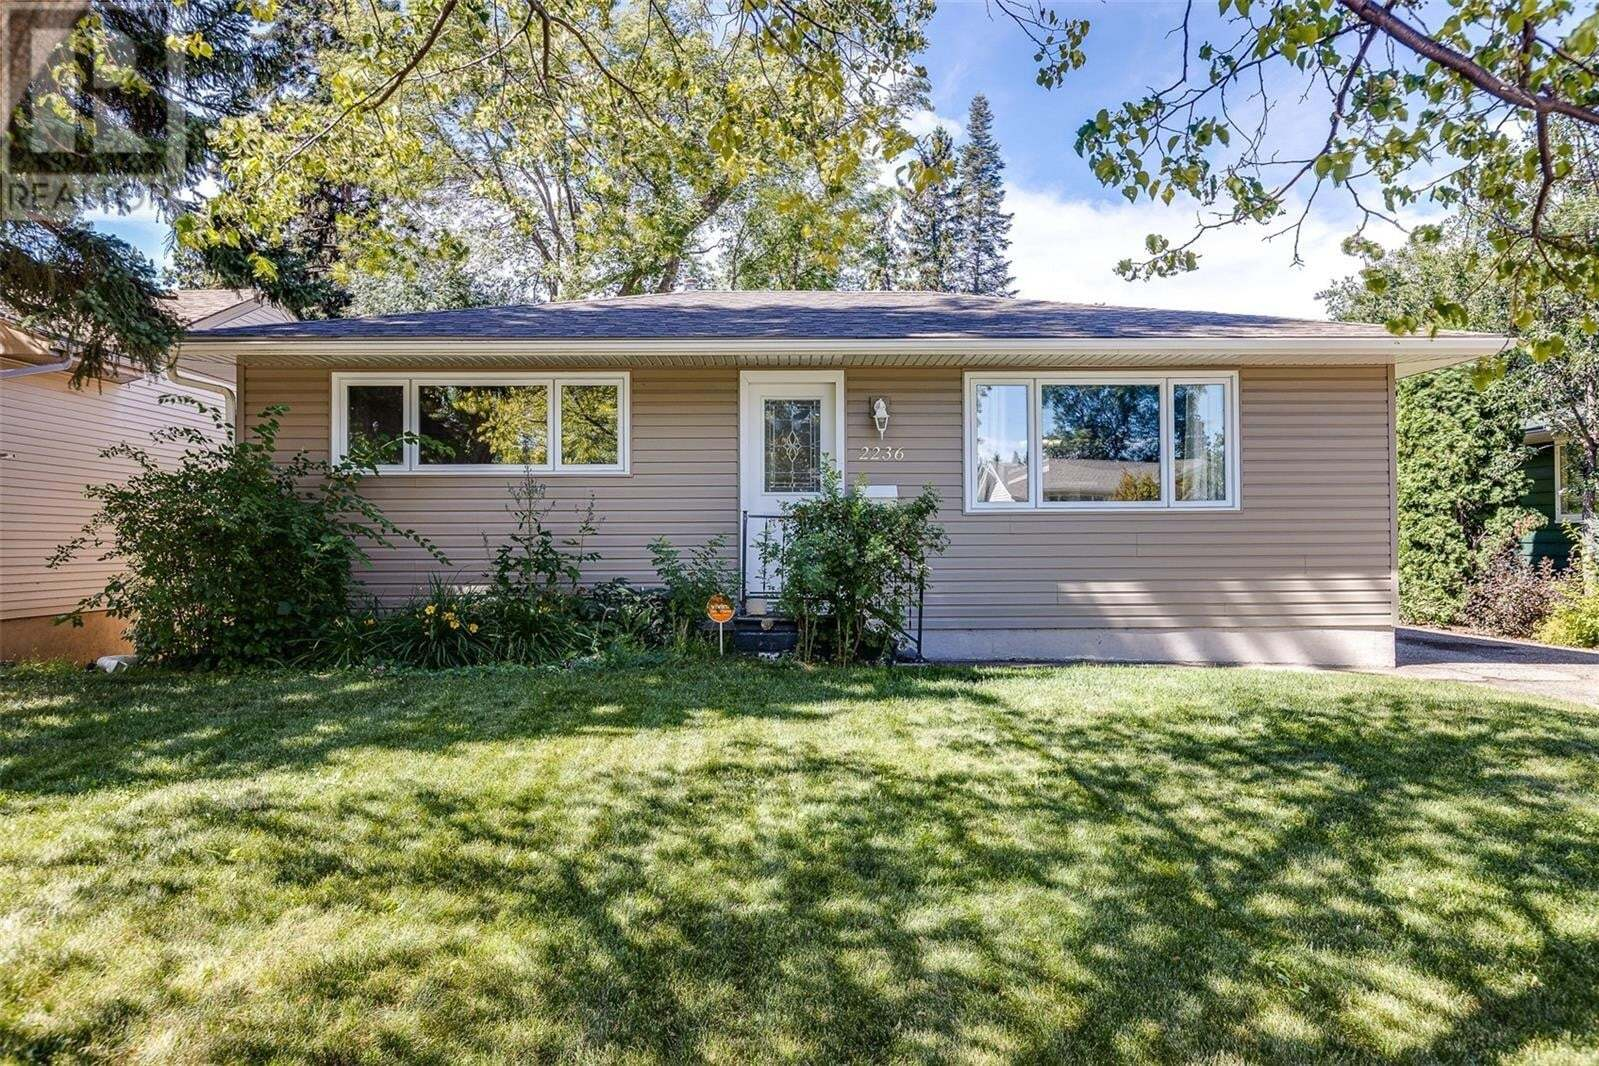 House for sale at 2236 Ewart Ave Saskatoon Saskatchewan - MLS: SK821430